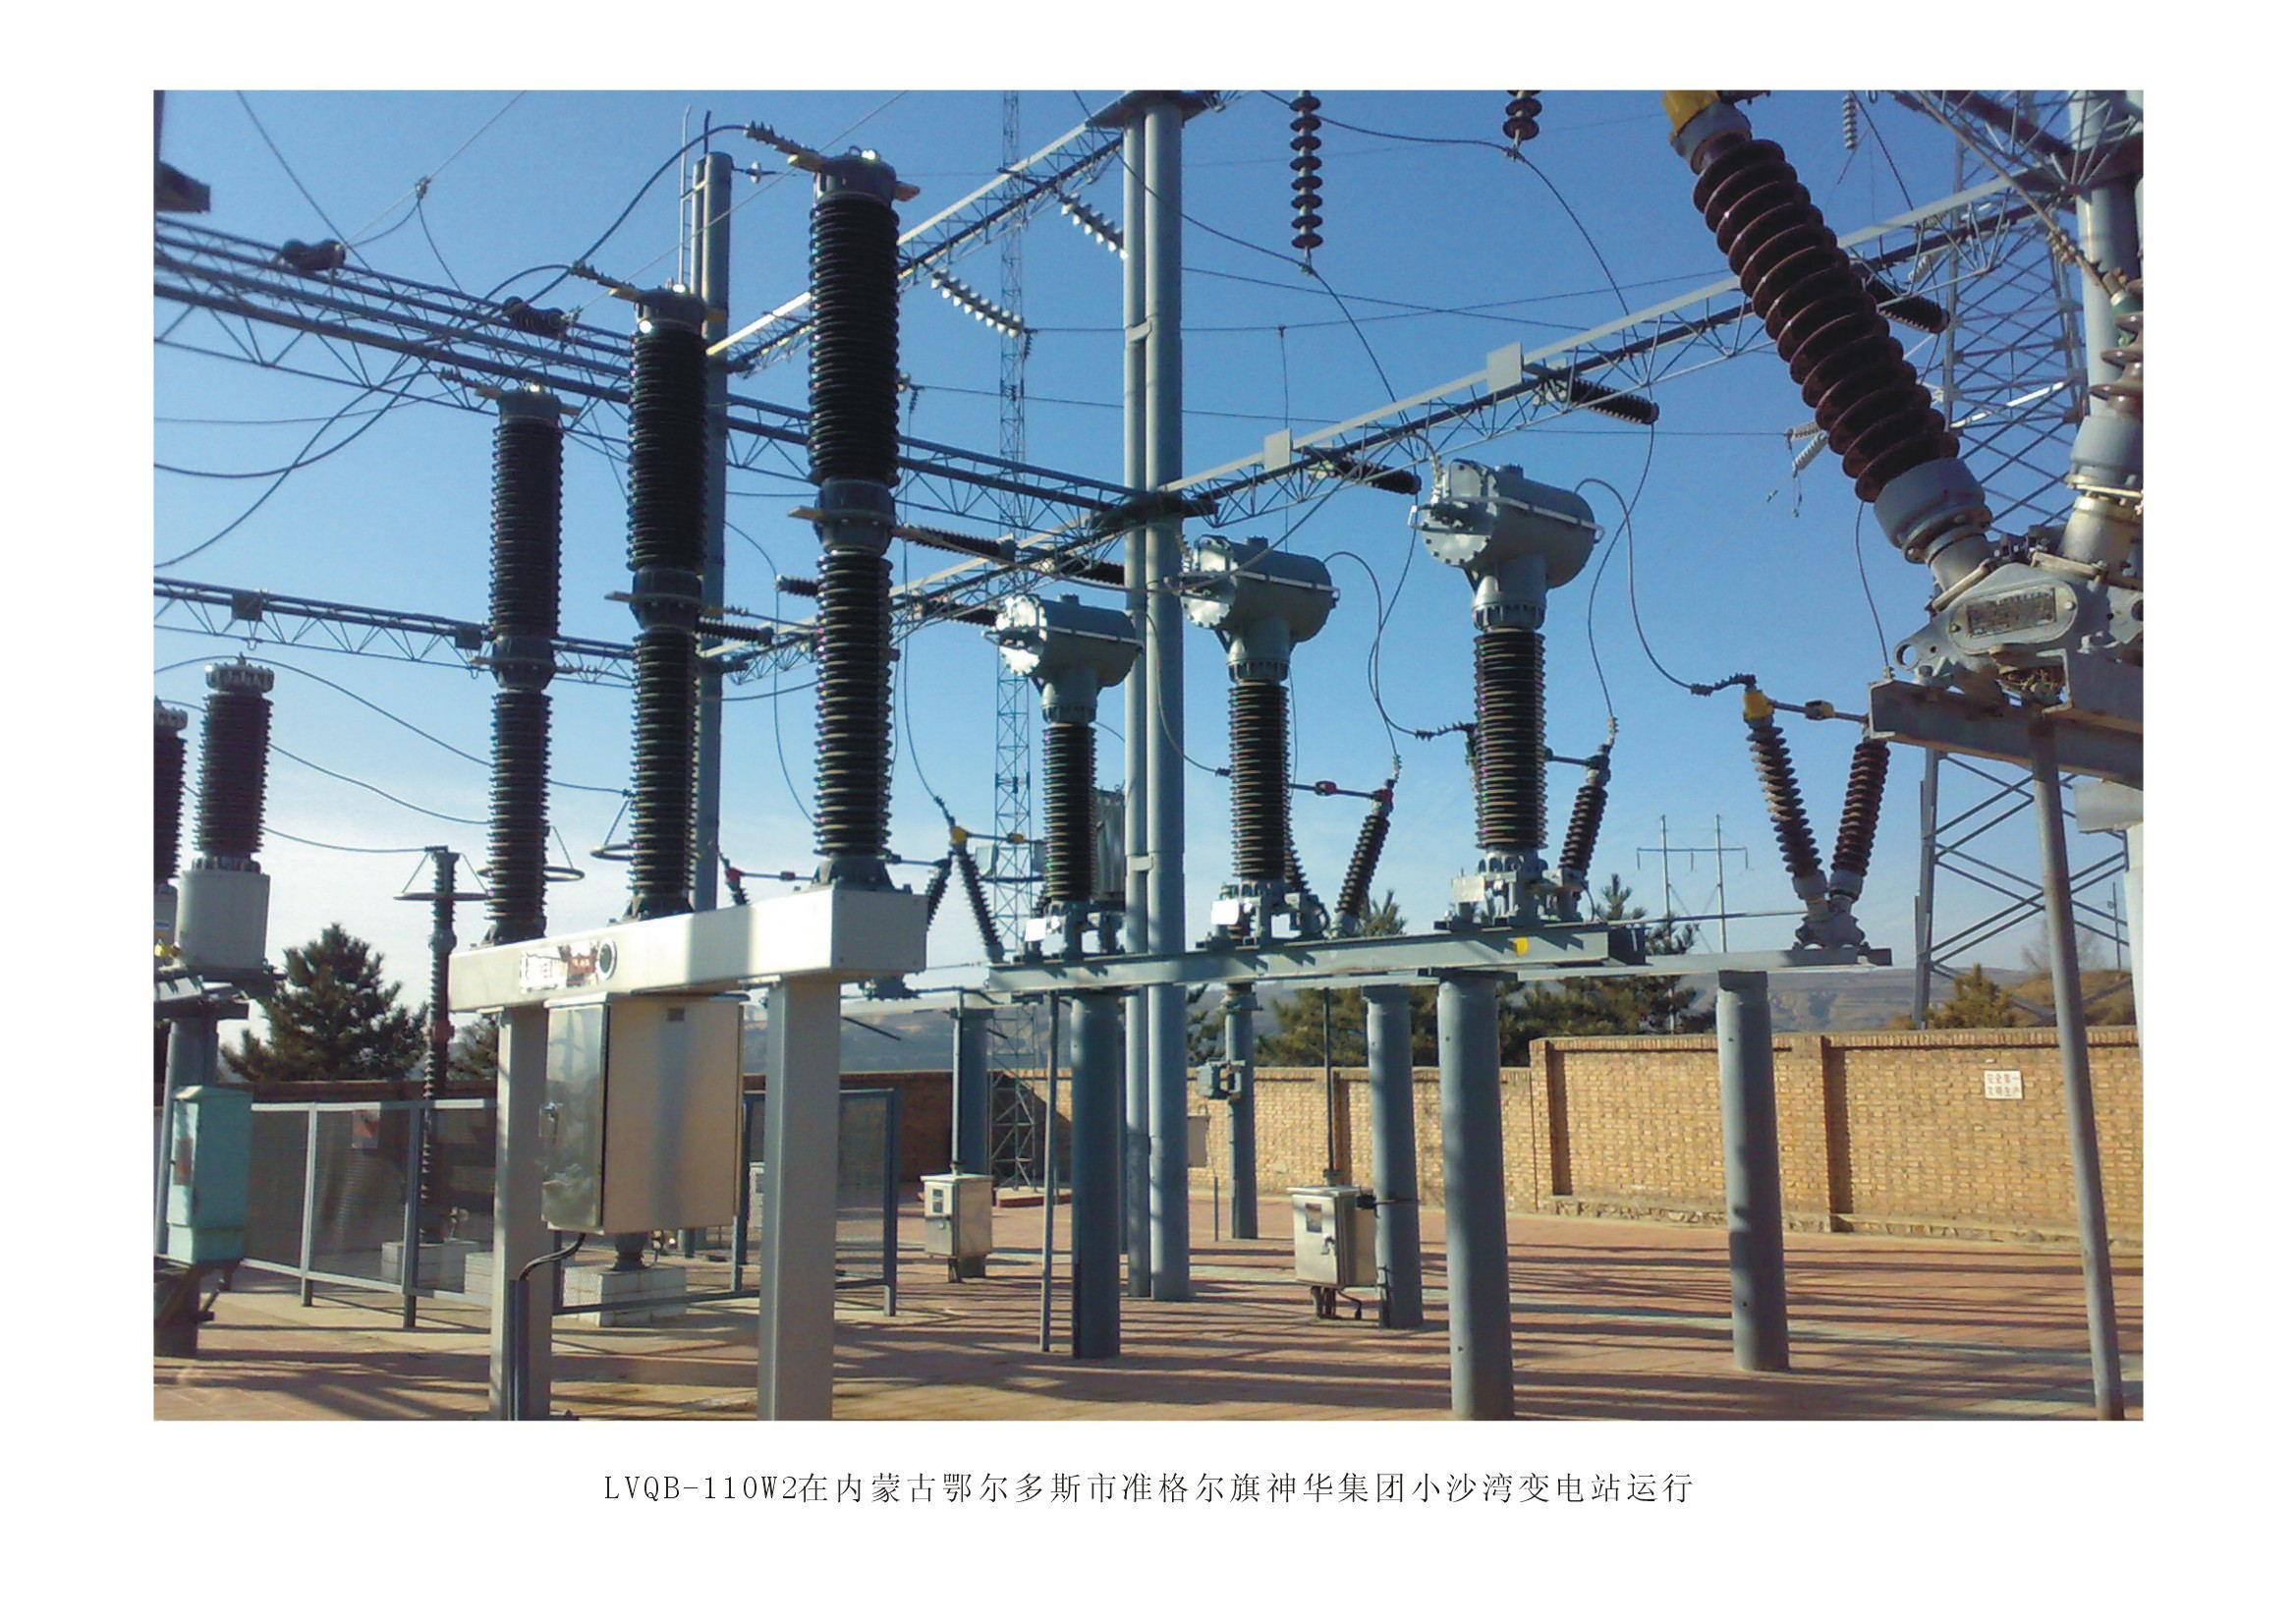 58LVQB-110W2在內蒙古鄂爾多斯市準格爾旗神華集團小沙灣變電站運行